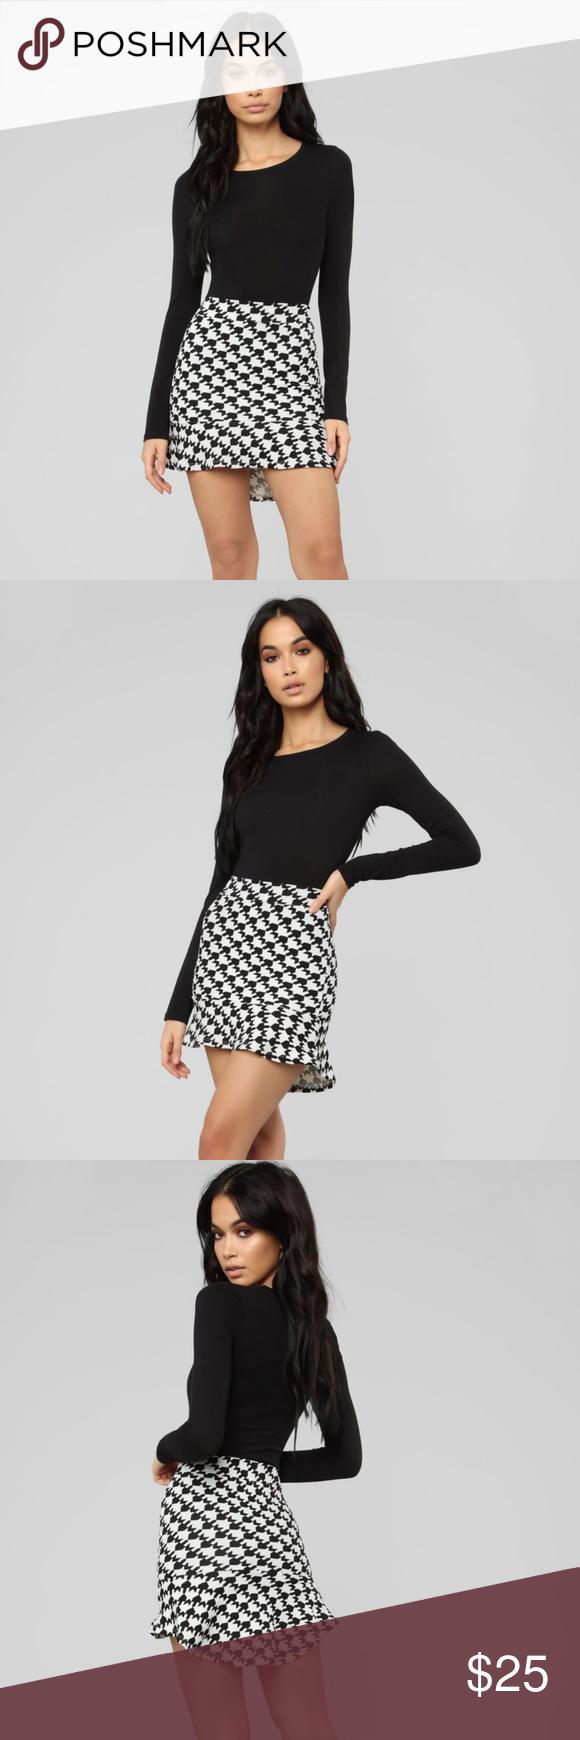 Houndstooth Skirt Fashion Nova